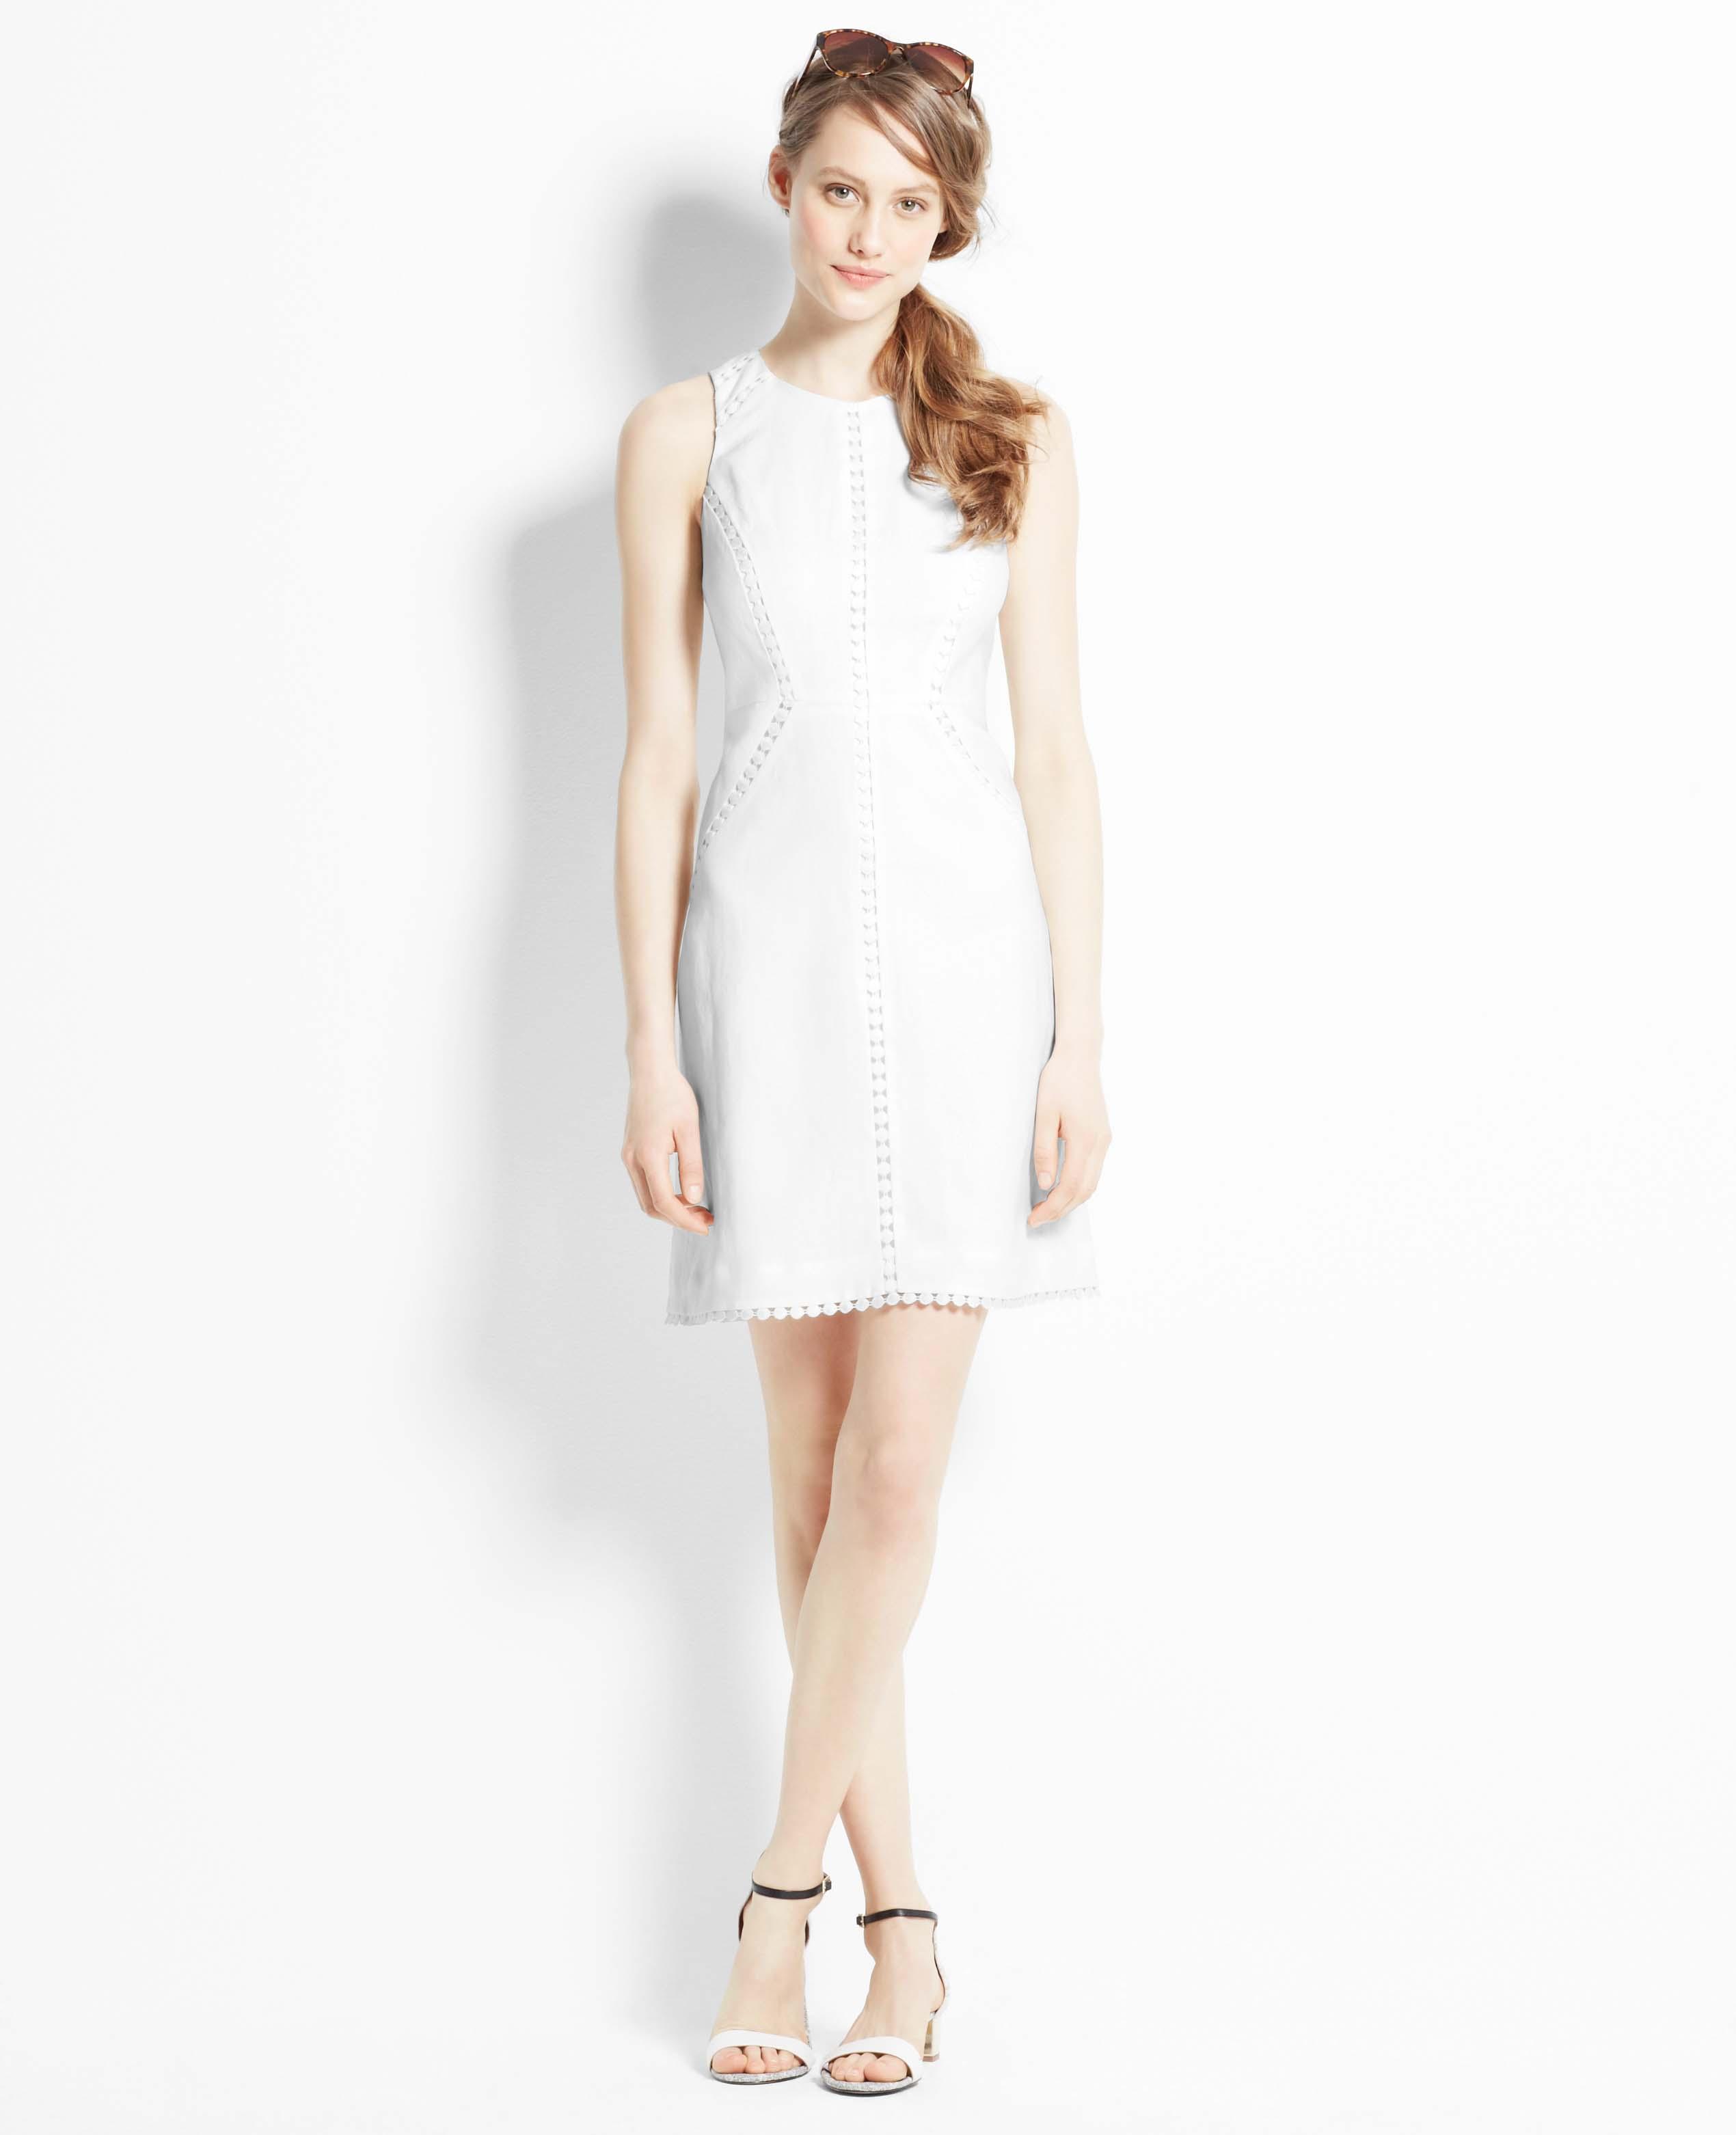 f9f76bdd73 Lyst - Ann Taylor Linen Sheath Dress in White